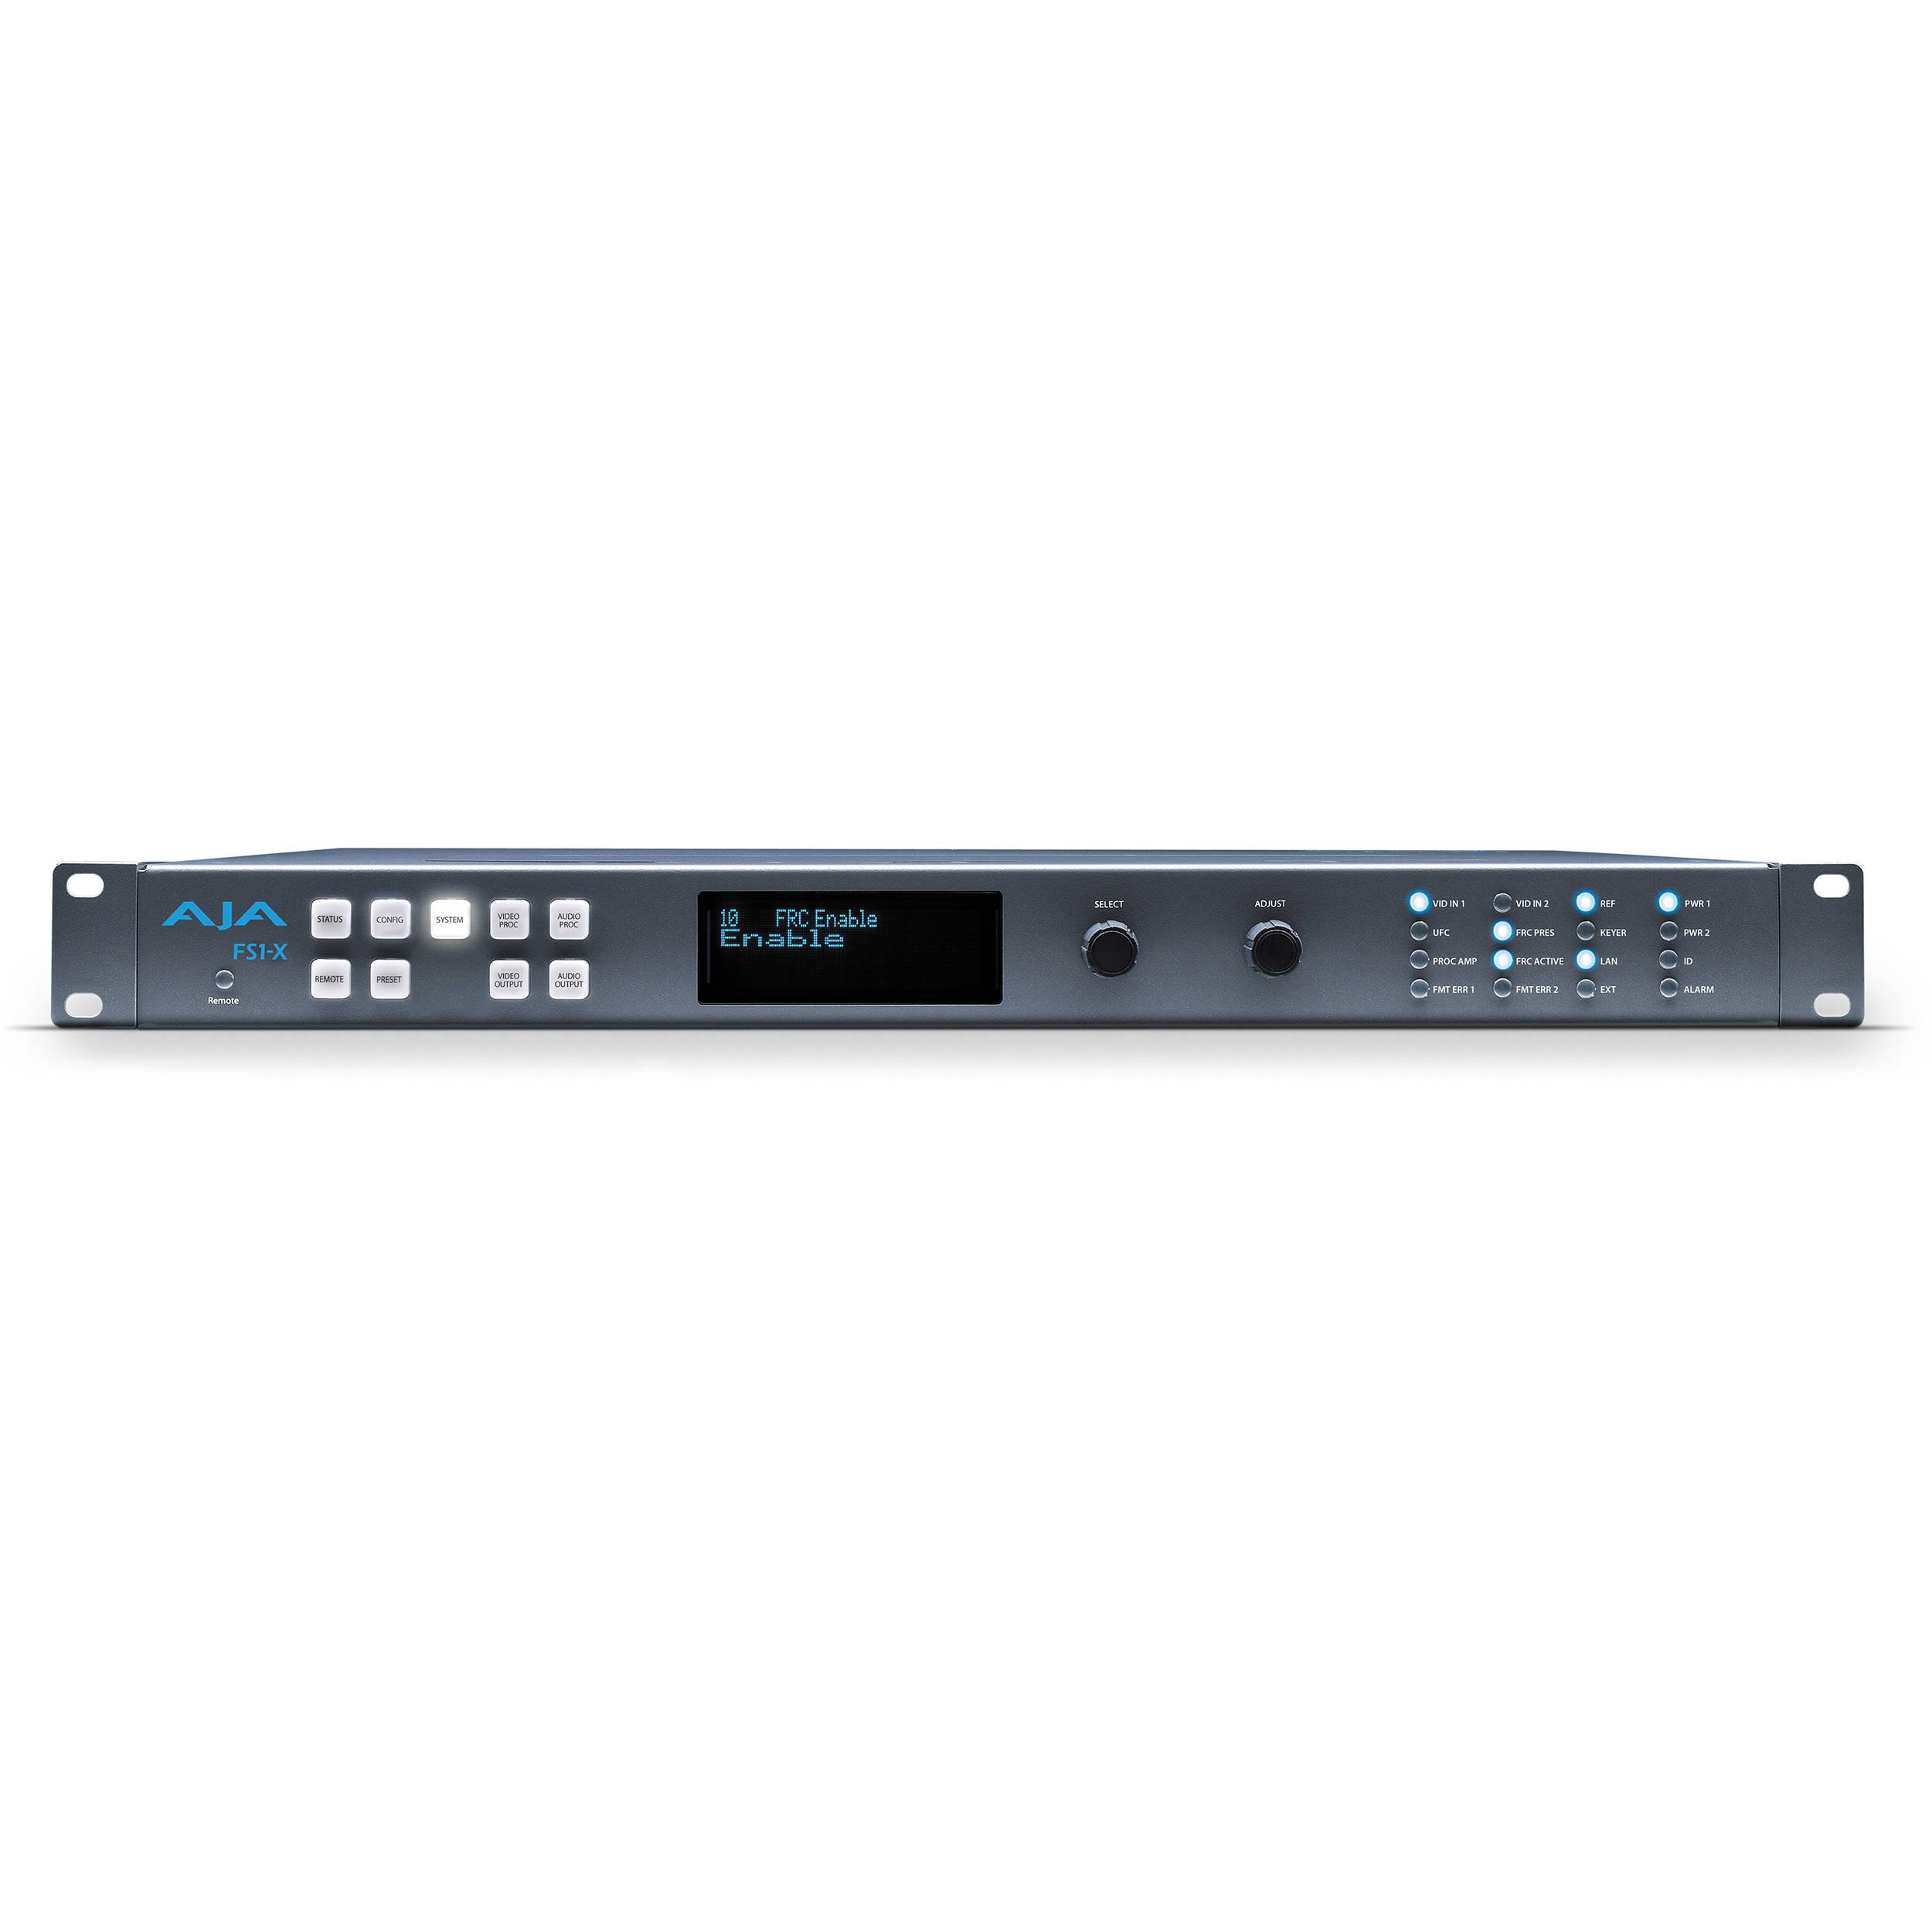 AJA FS1-X Frame Synchronizer & Converter FS1-X W FRC B&H